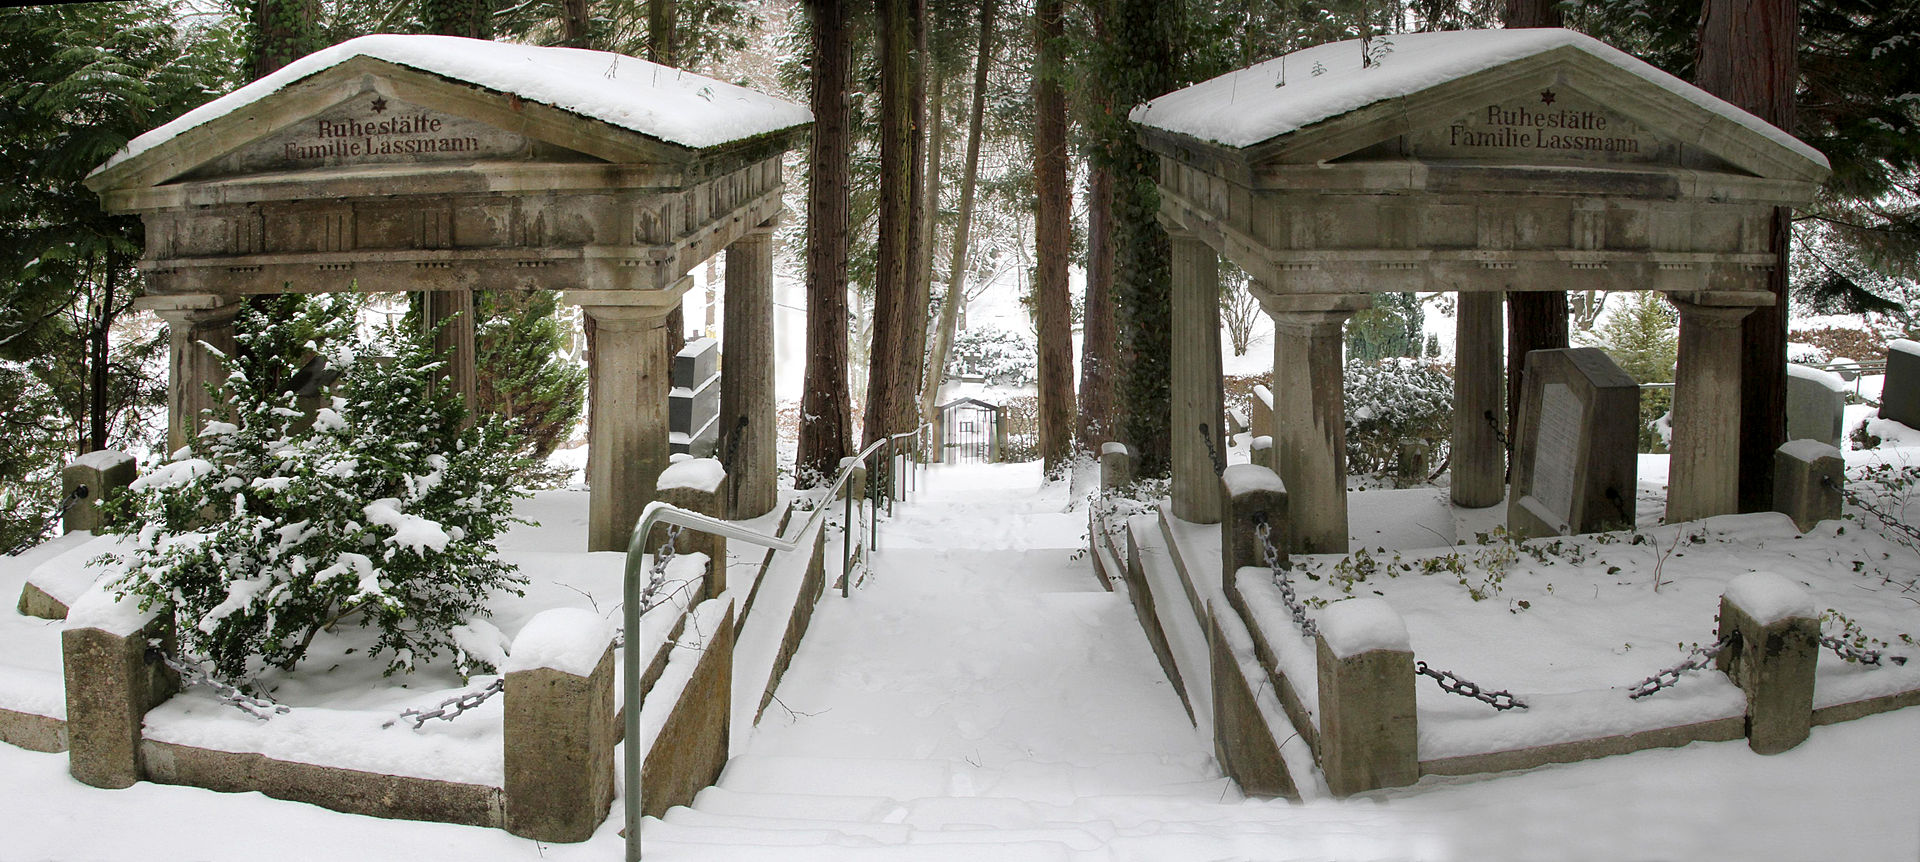 Baden-Baden-Friedhof Lichtental-juedischer Teil-05-gje.jpg